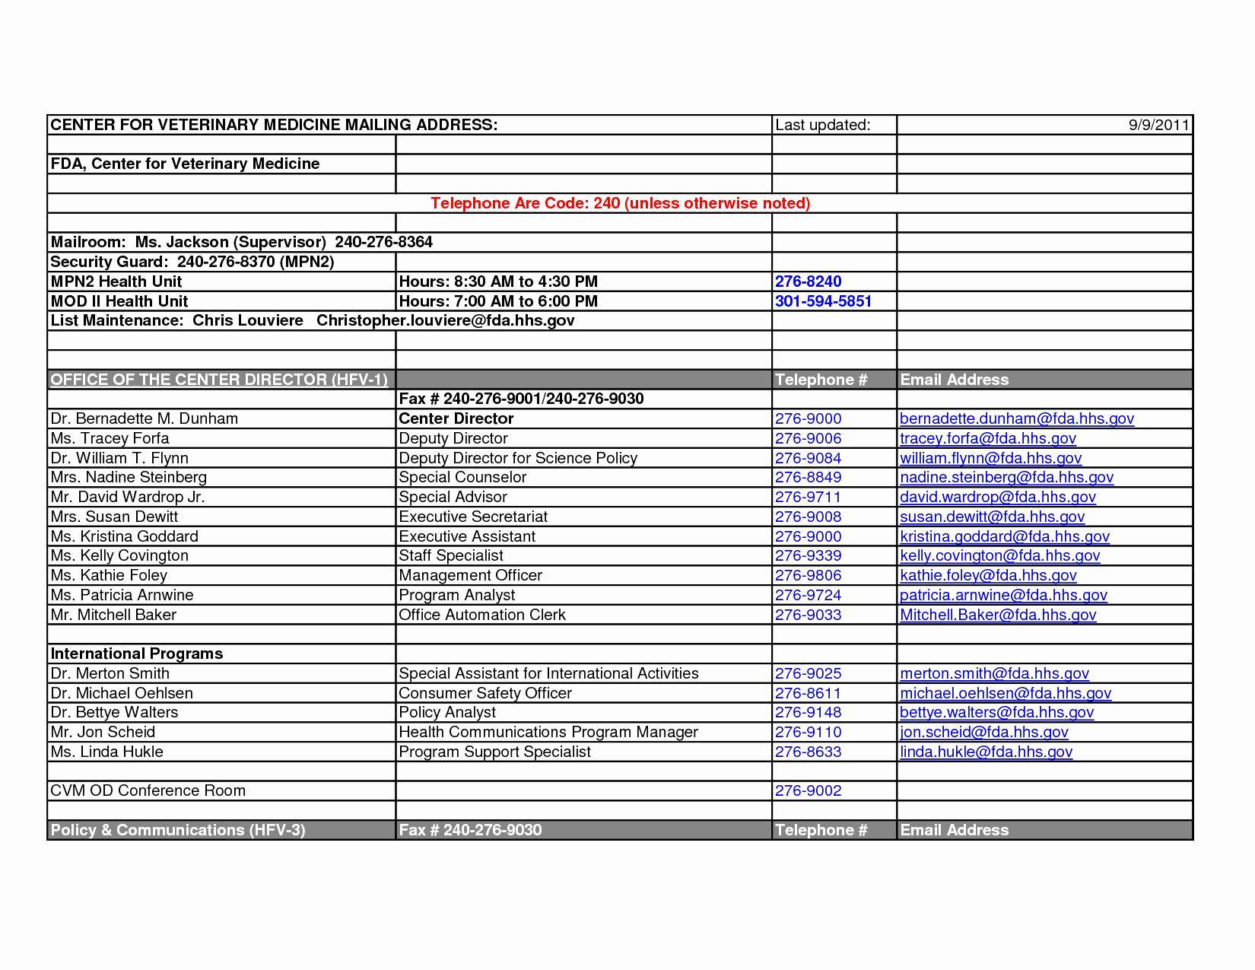 Geocode Excel Spreadsheet Intended For Geocode Spreadsheet Fresh Free Catering Proposal Template Elegant